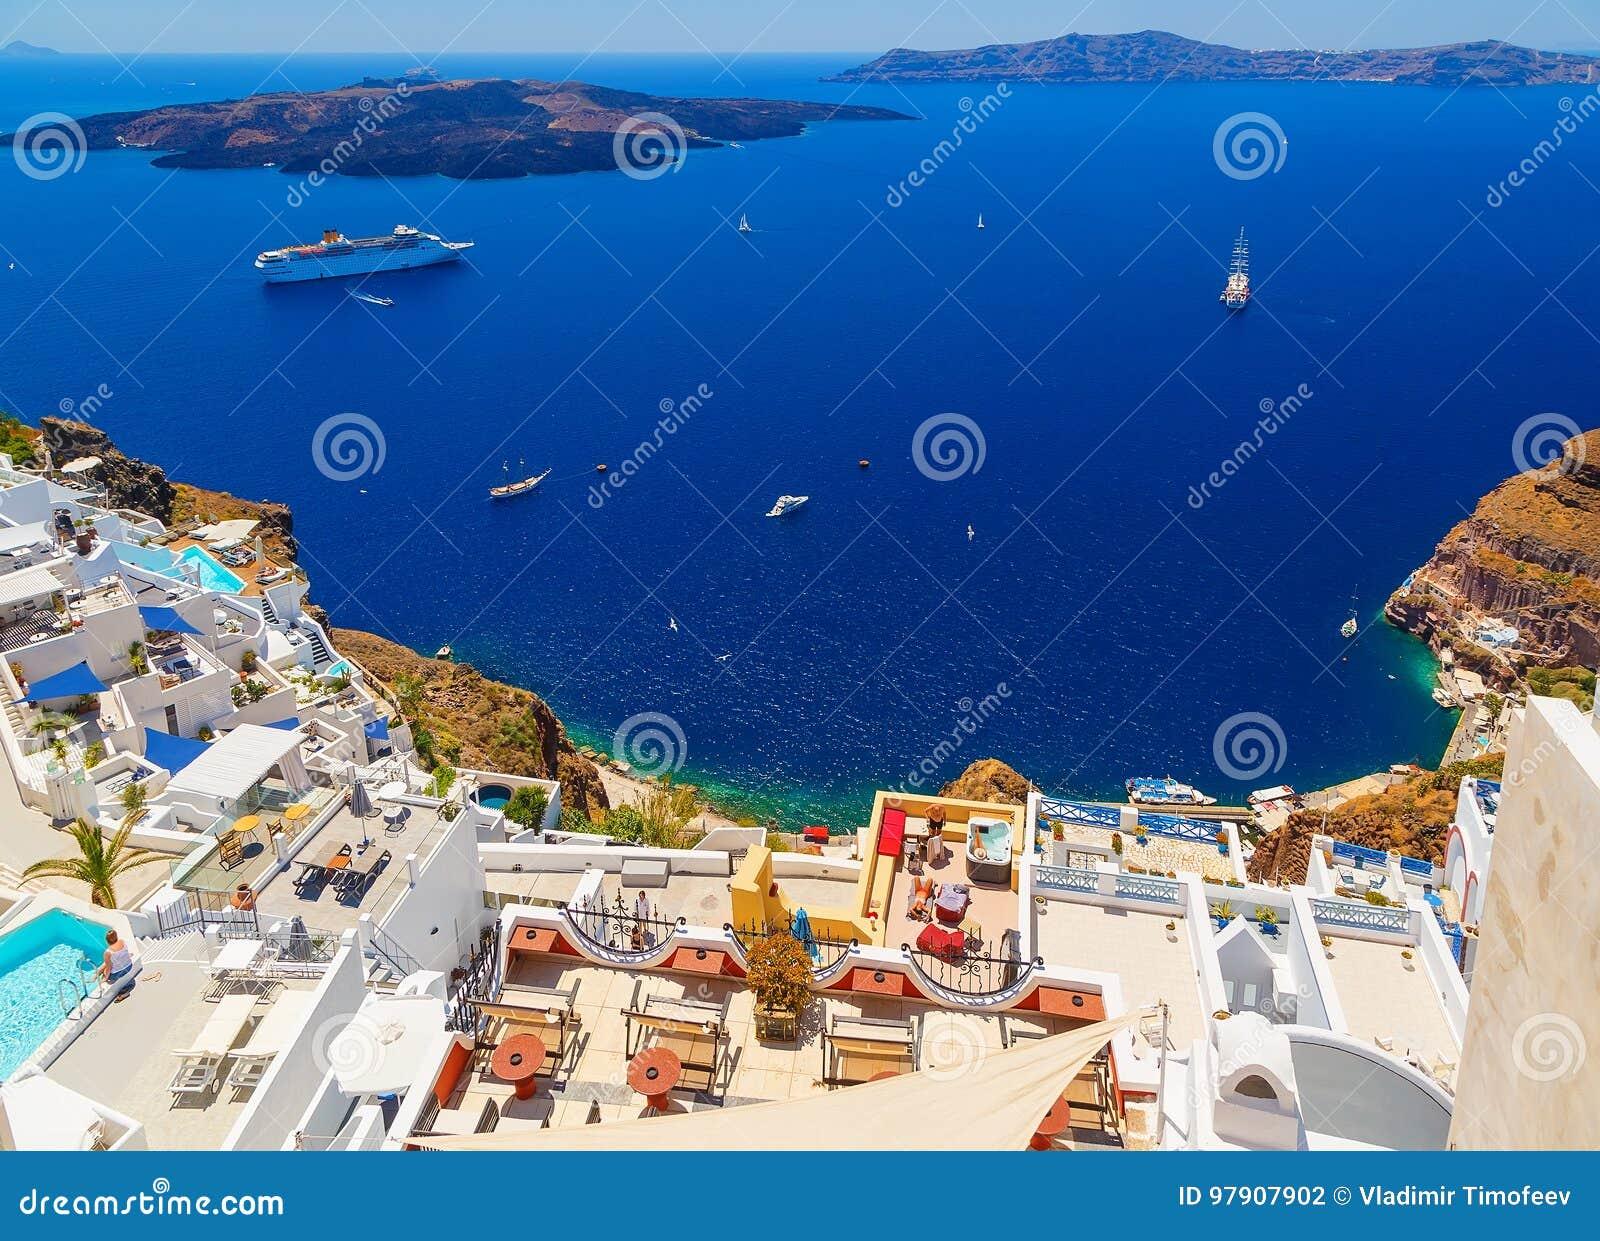 Santorini volcanic caldera as seen from Fira, capital of Santorini, Greece. Hotels with vacationing tourists